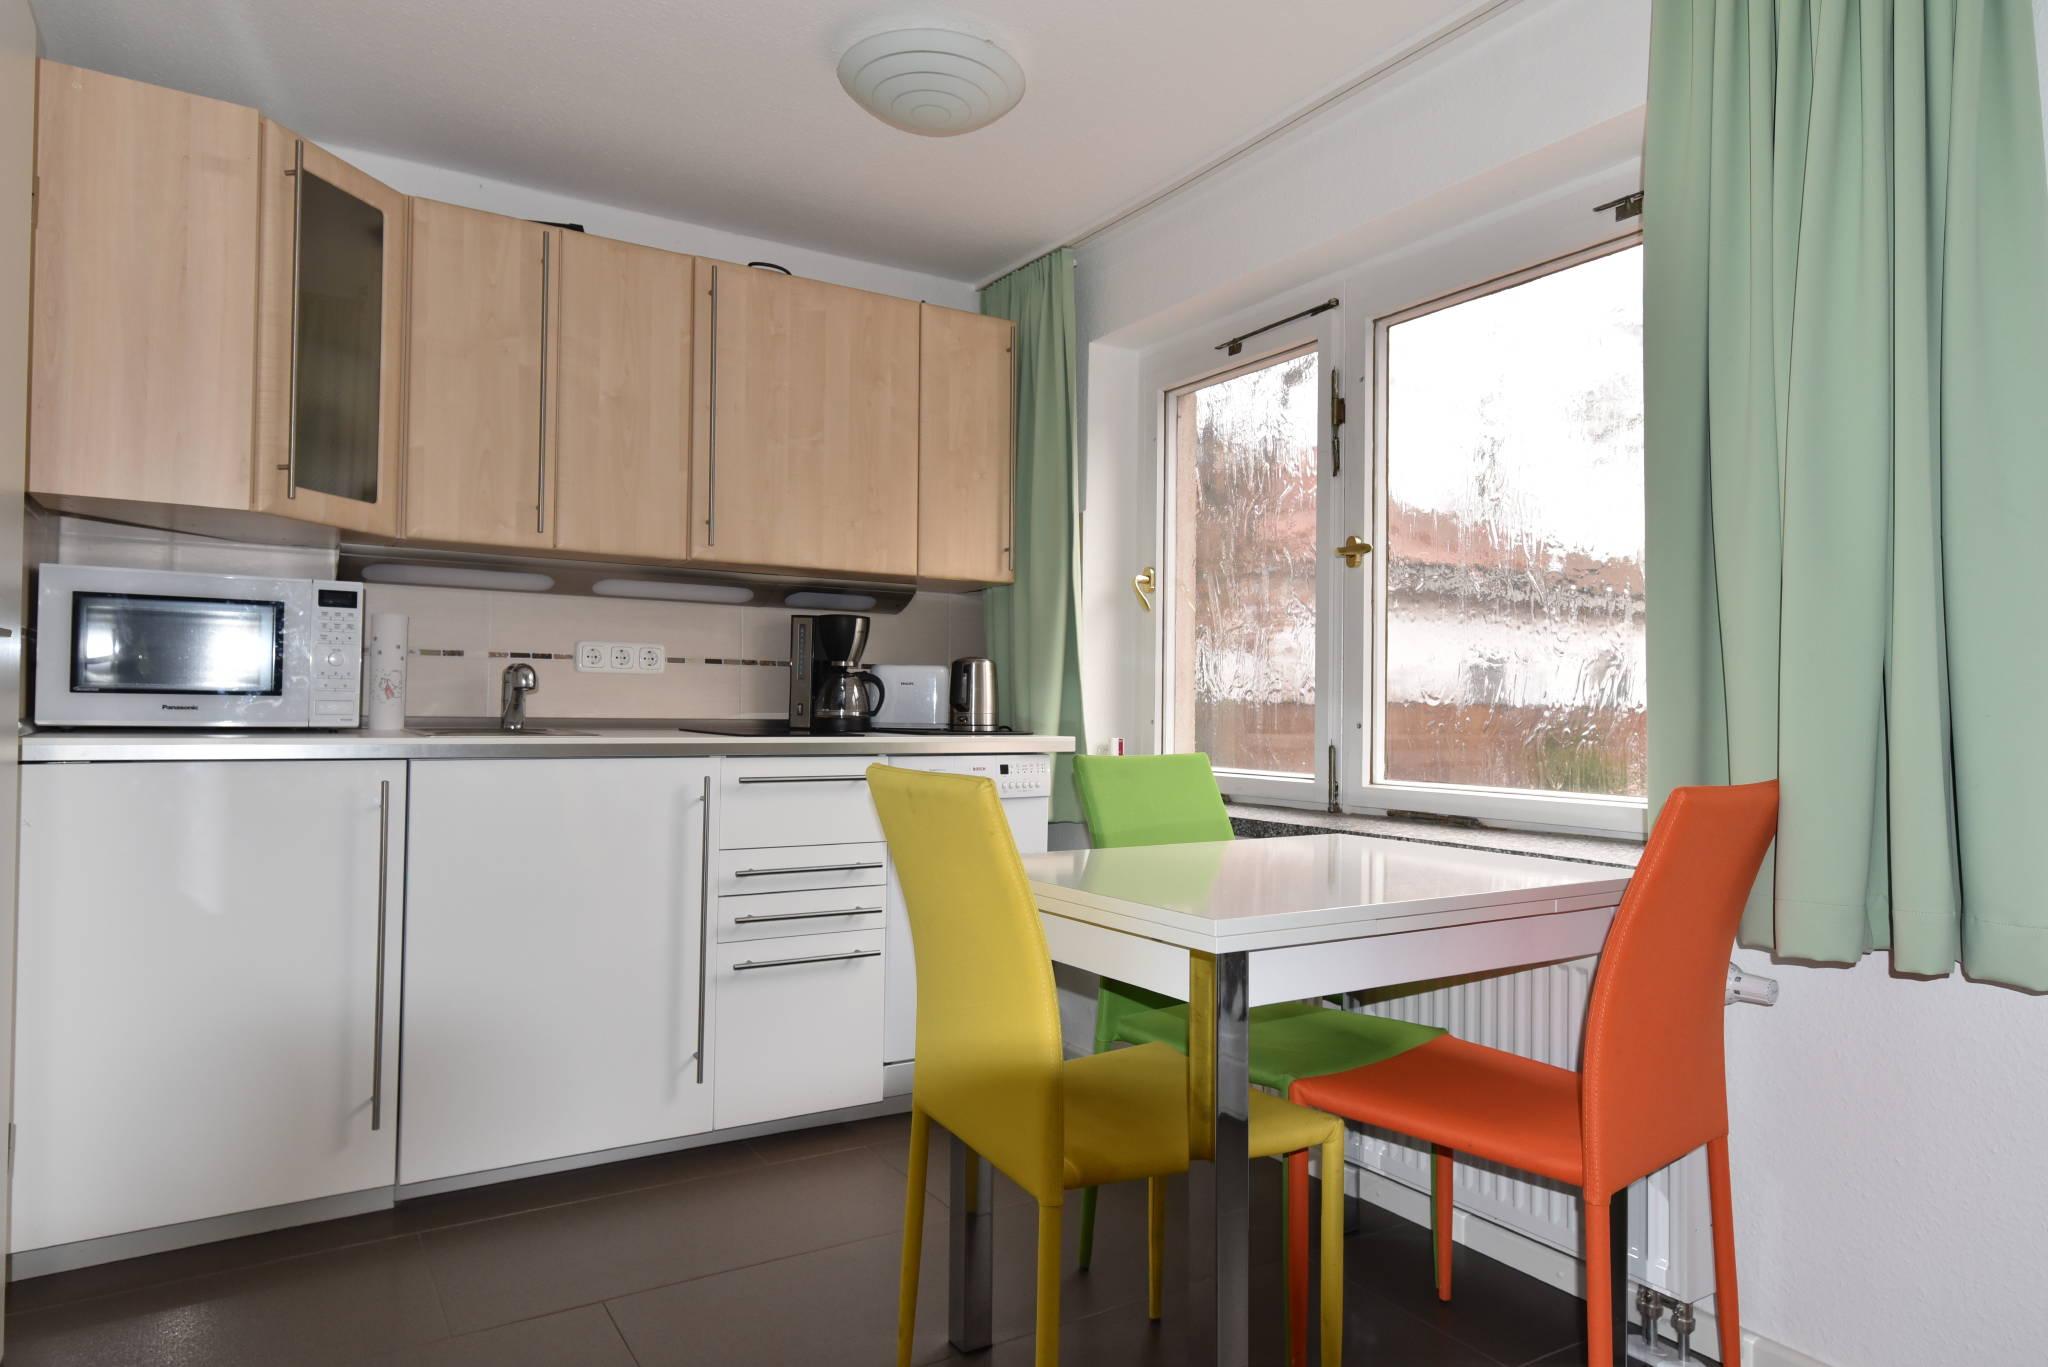 Bomann Kühlschrank Lüfter : Kuehlschrank leise kühlschranklüfter anschließen wohnmobil forum